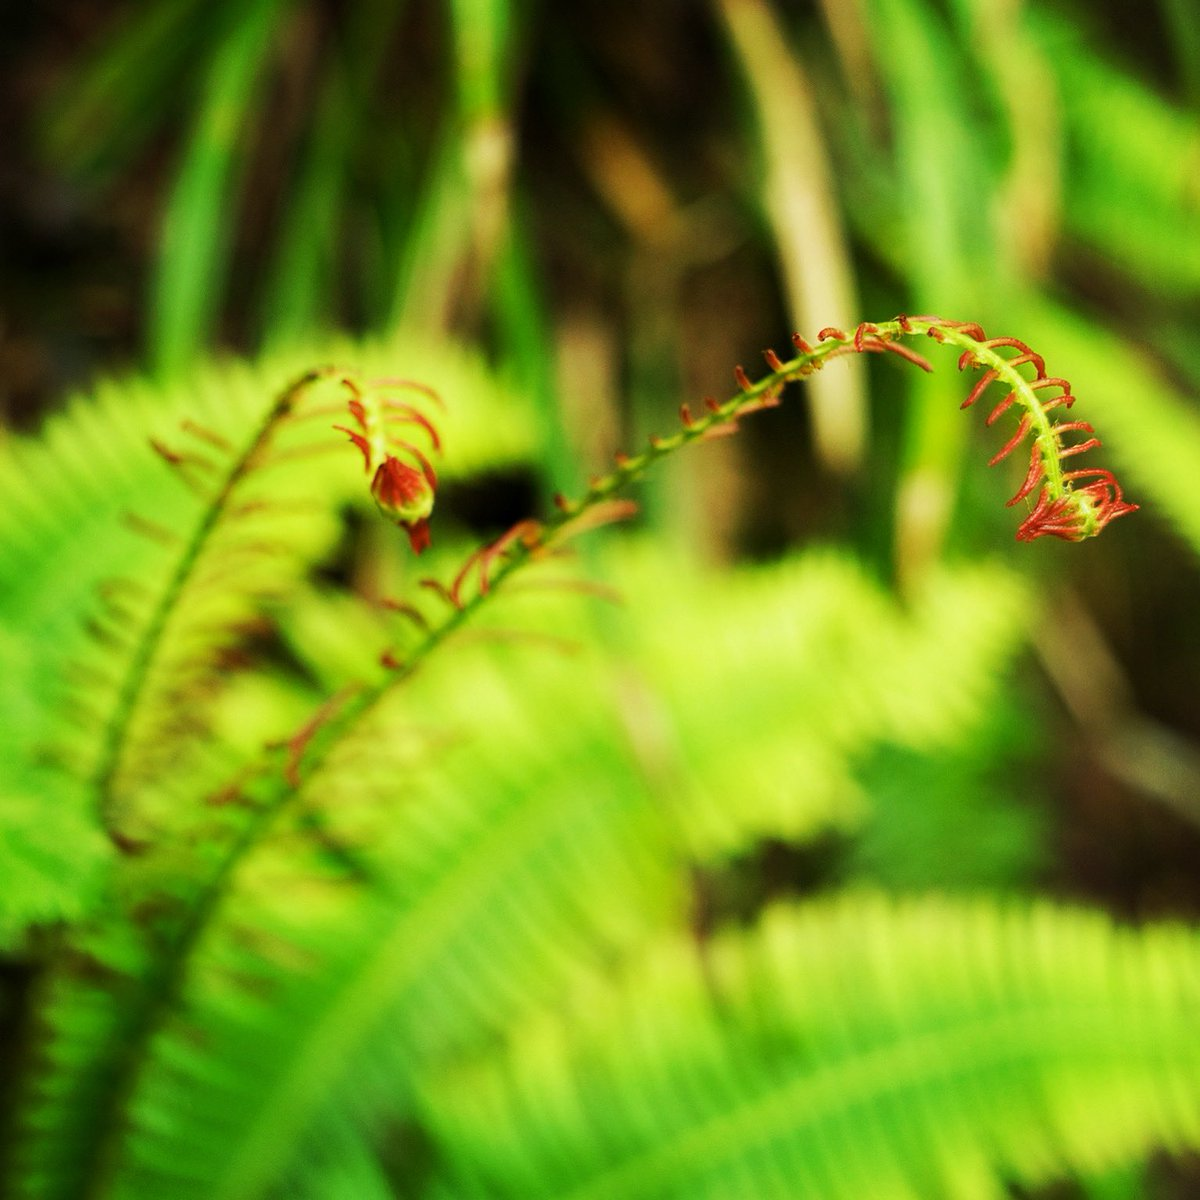 The Fern #snapshot #fernplant #intheforest #写真好きな人と繋がりたい #キリトリセカイ #ファインダー越しの私の世界 #東京カメラ部 #東京写真部 #pashadelic #森の中pic.twitter.com/R6ITrxKOoj